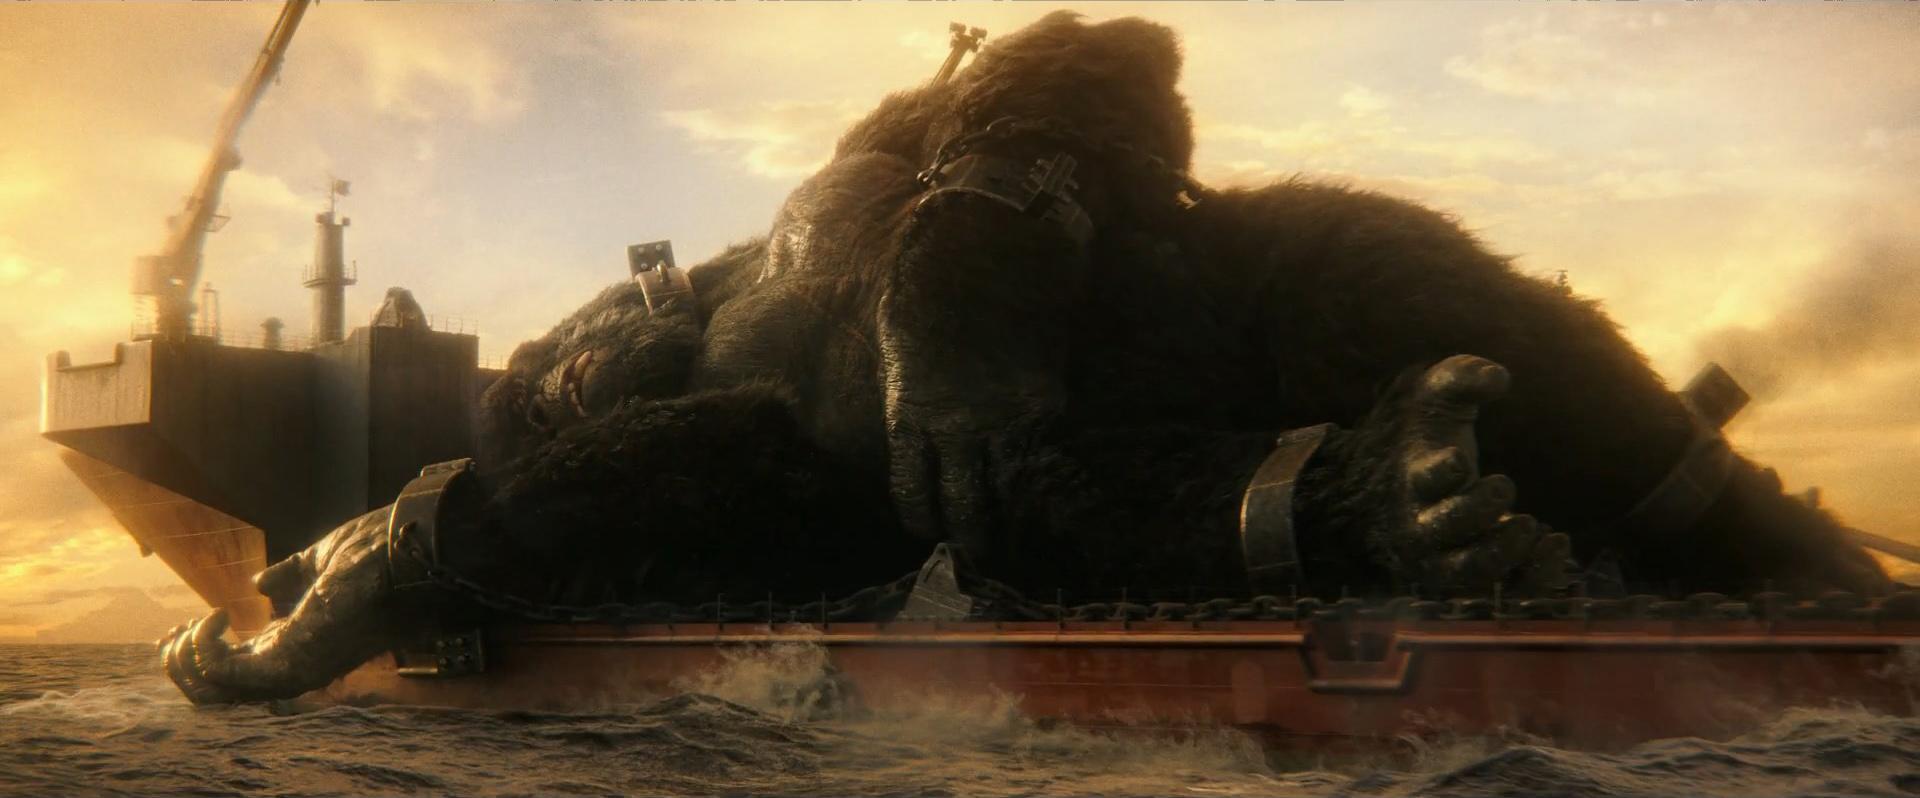 Godzilla vs Kong Trailer Still 07 - Kong chained